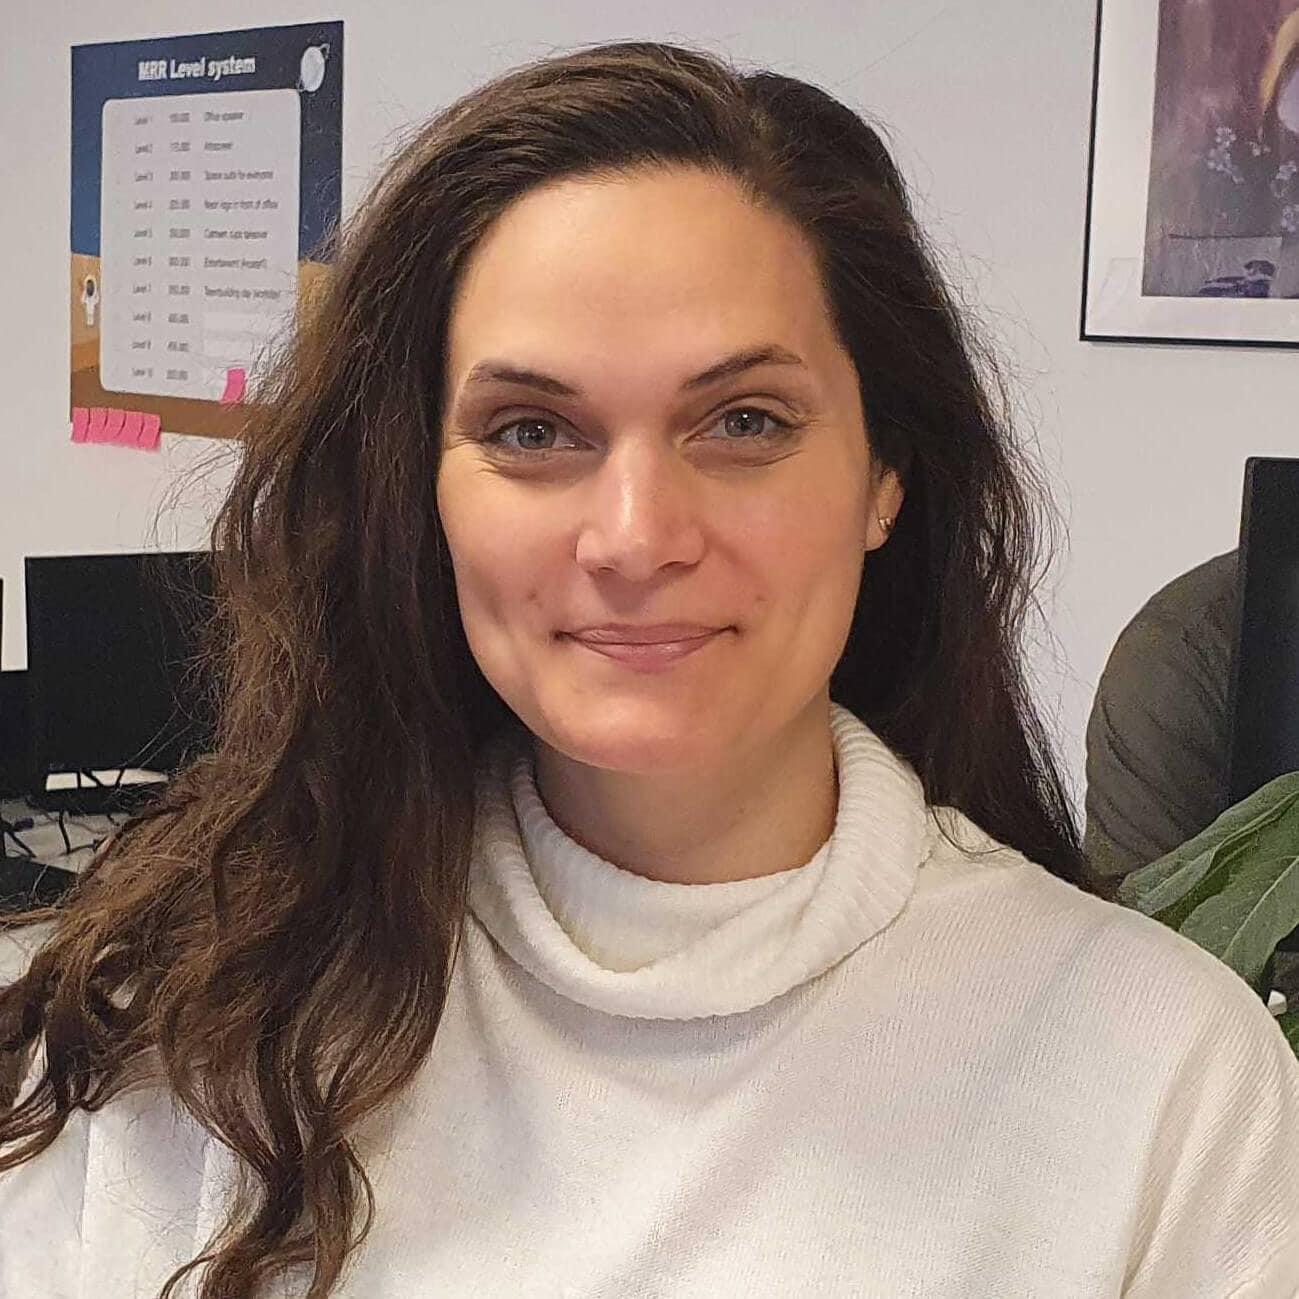 Nevena Koluvija, Sales Development Representative at Morningscore